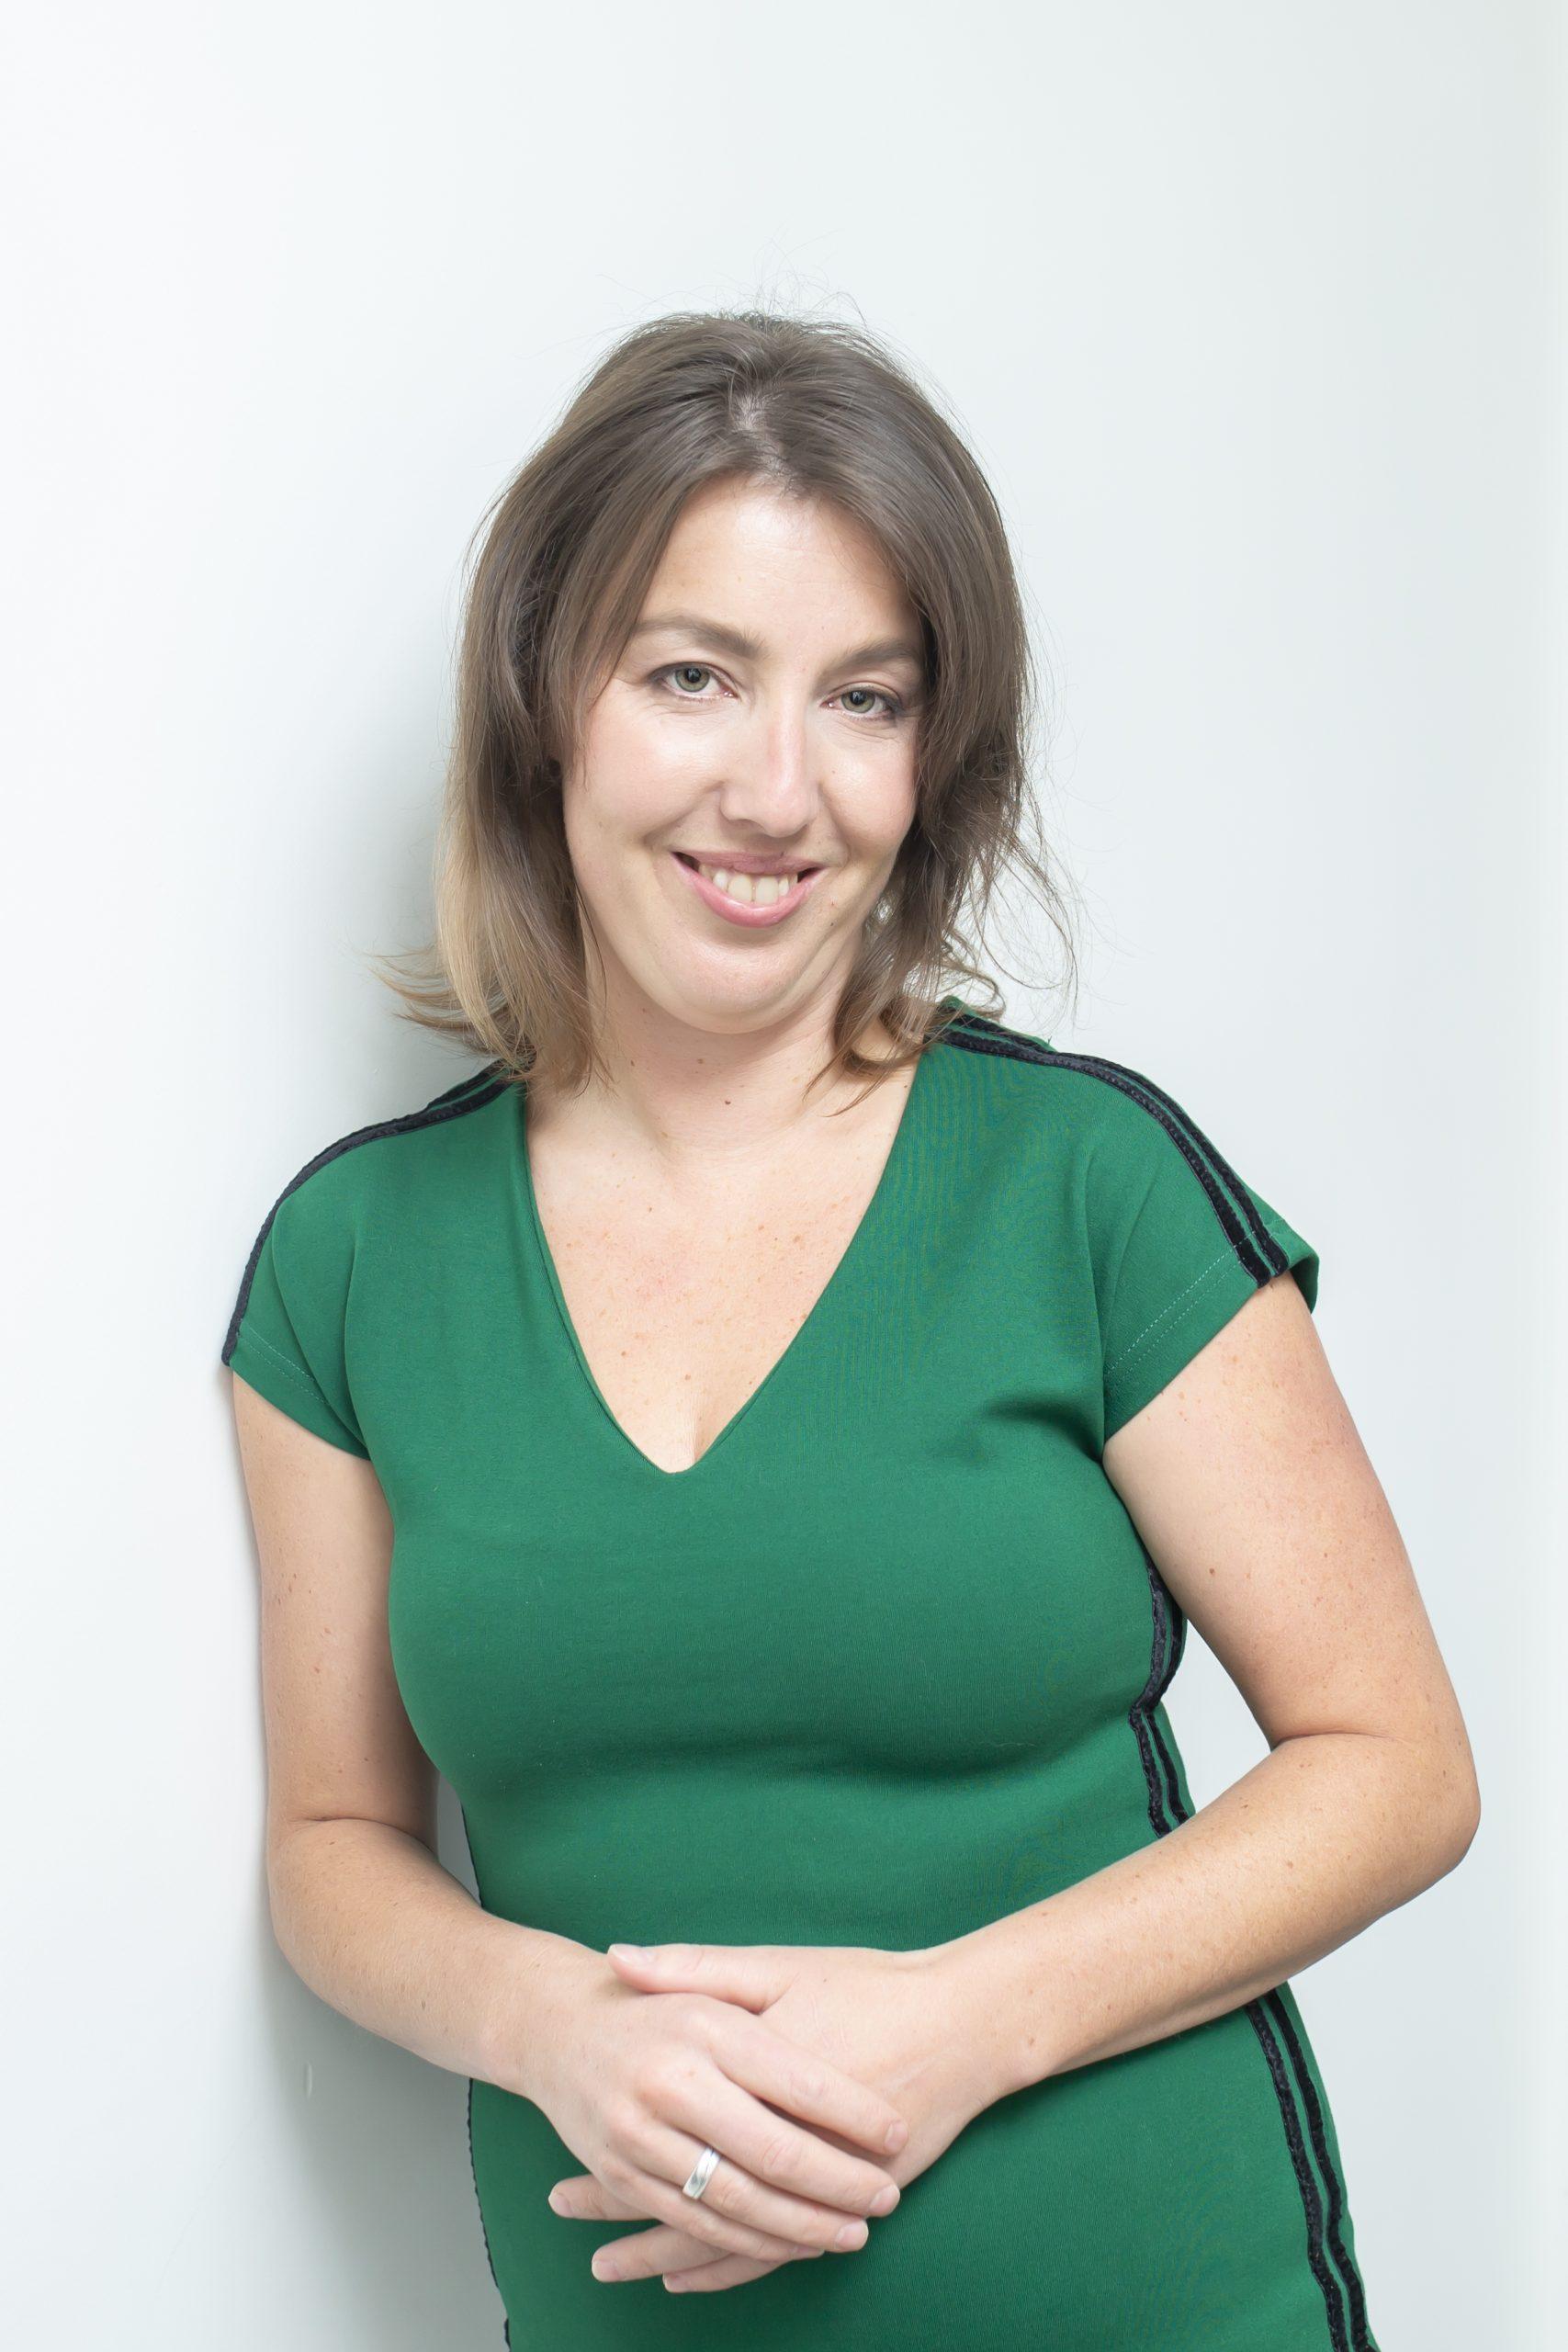 Wendy Govers van Thiel